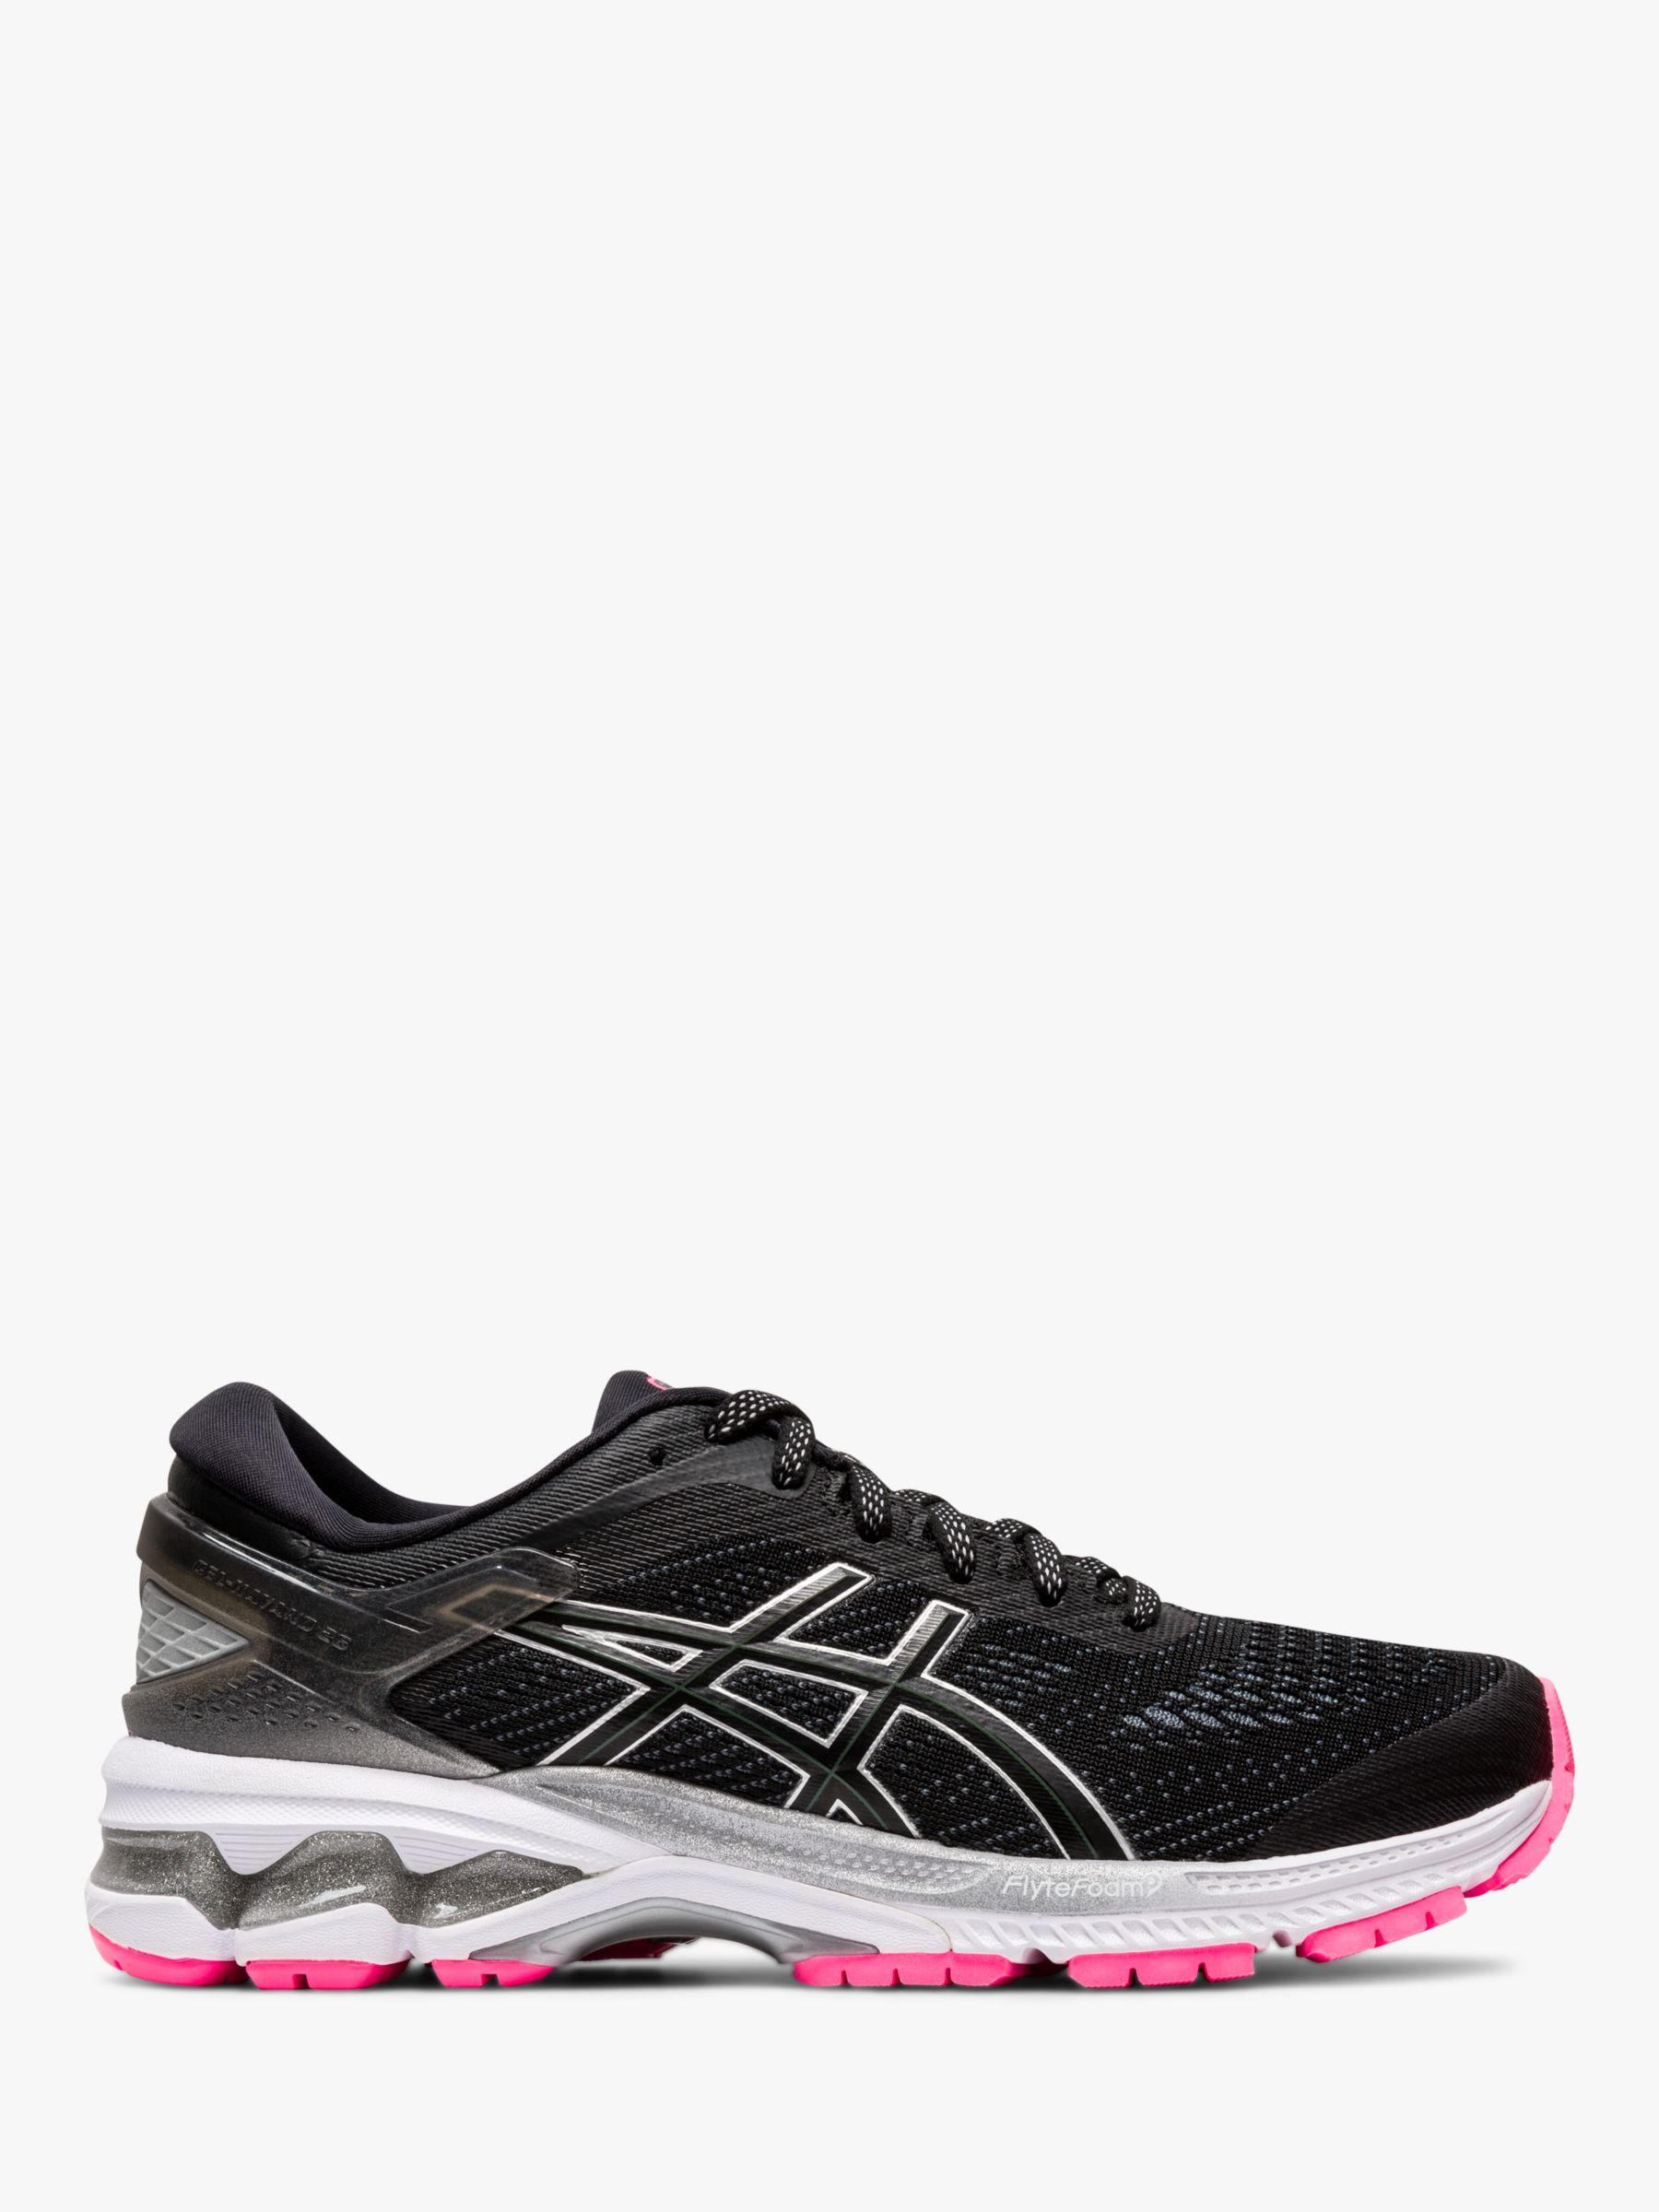 ASICS ASICS GEL-KAYANO 26 Lite-Show Women's Running Shoes, Black